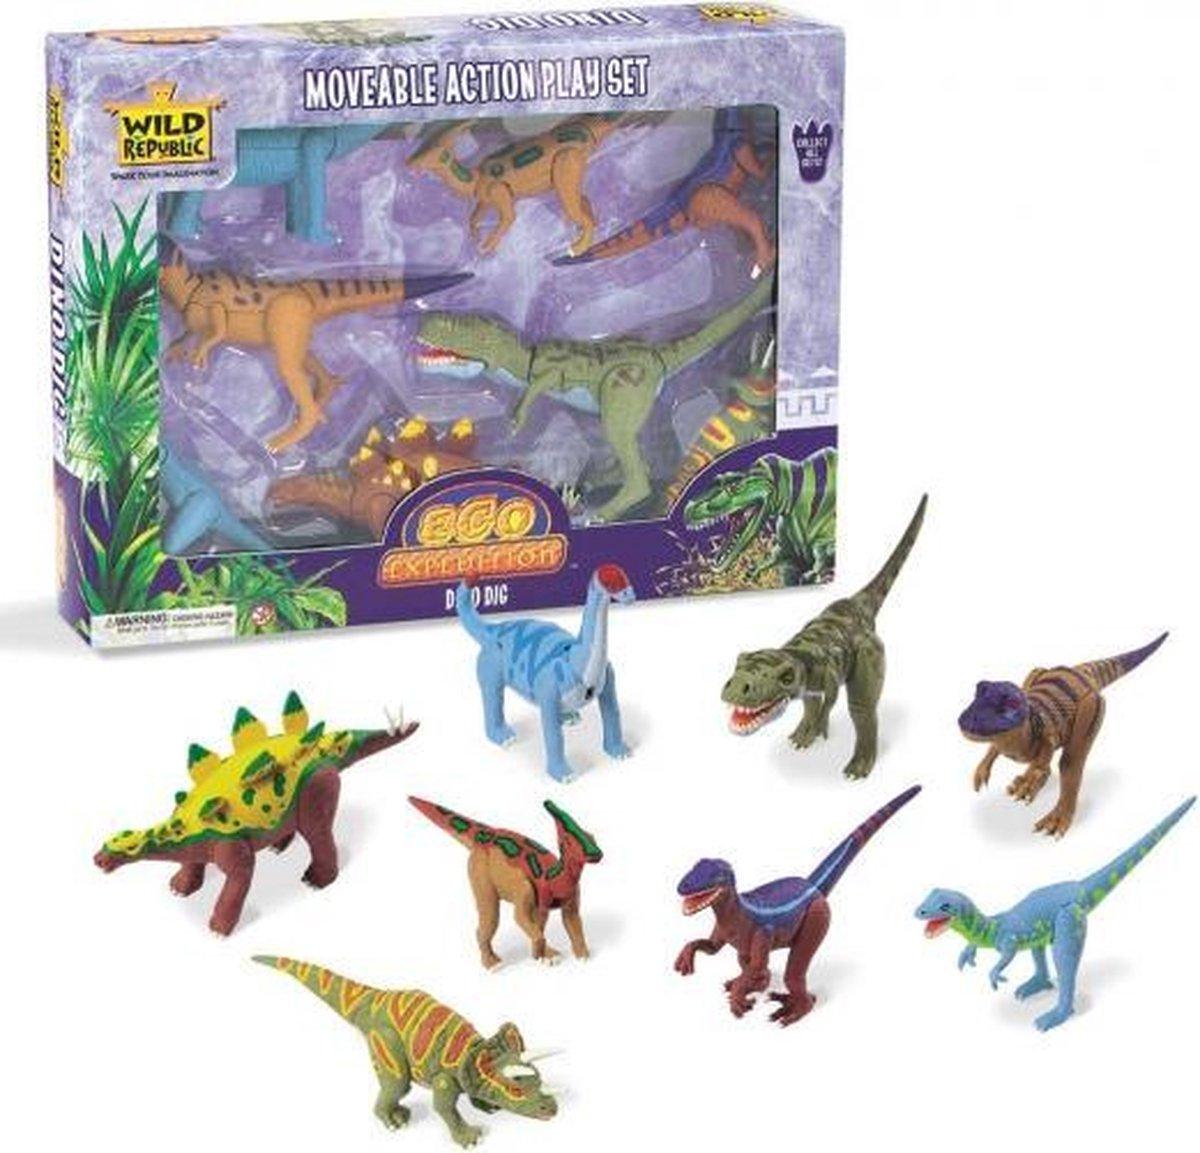 Dinosaurus speelgoed set - Wild Republic